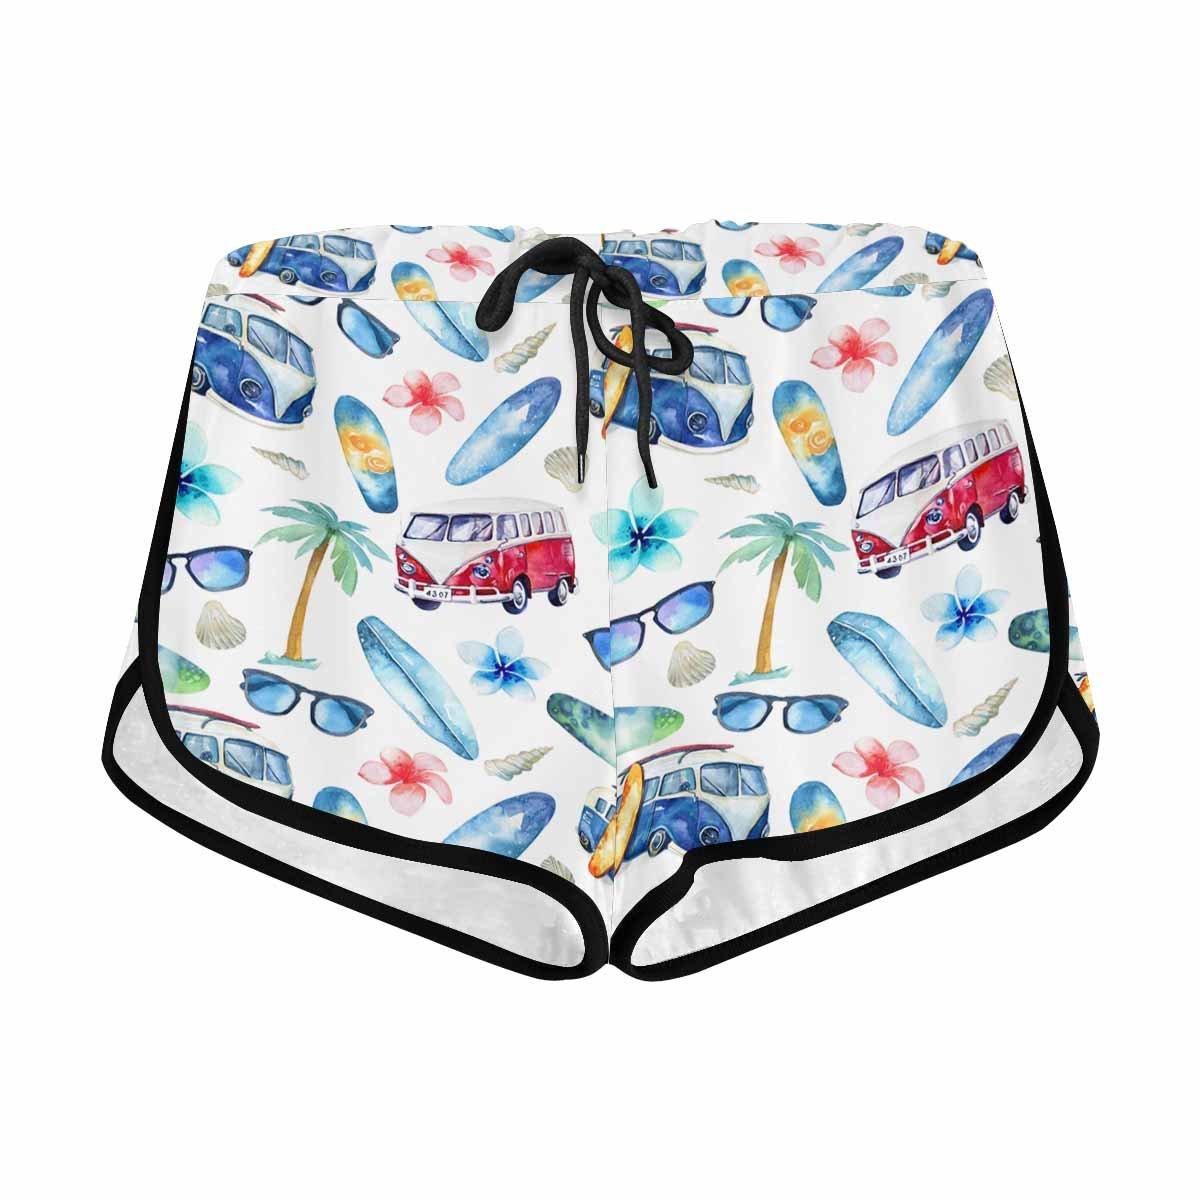 InterestPrint Women Seaside Travel Bus Sunglasses Perfomance Running Yoga Gym Workout Athletic Shorts S